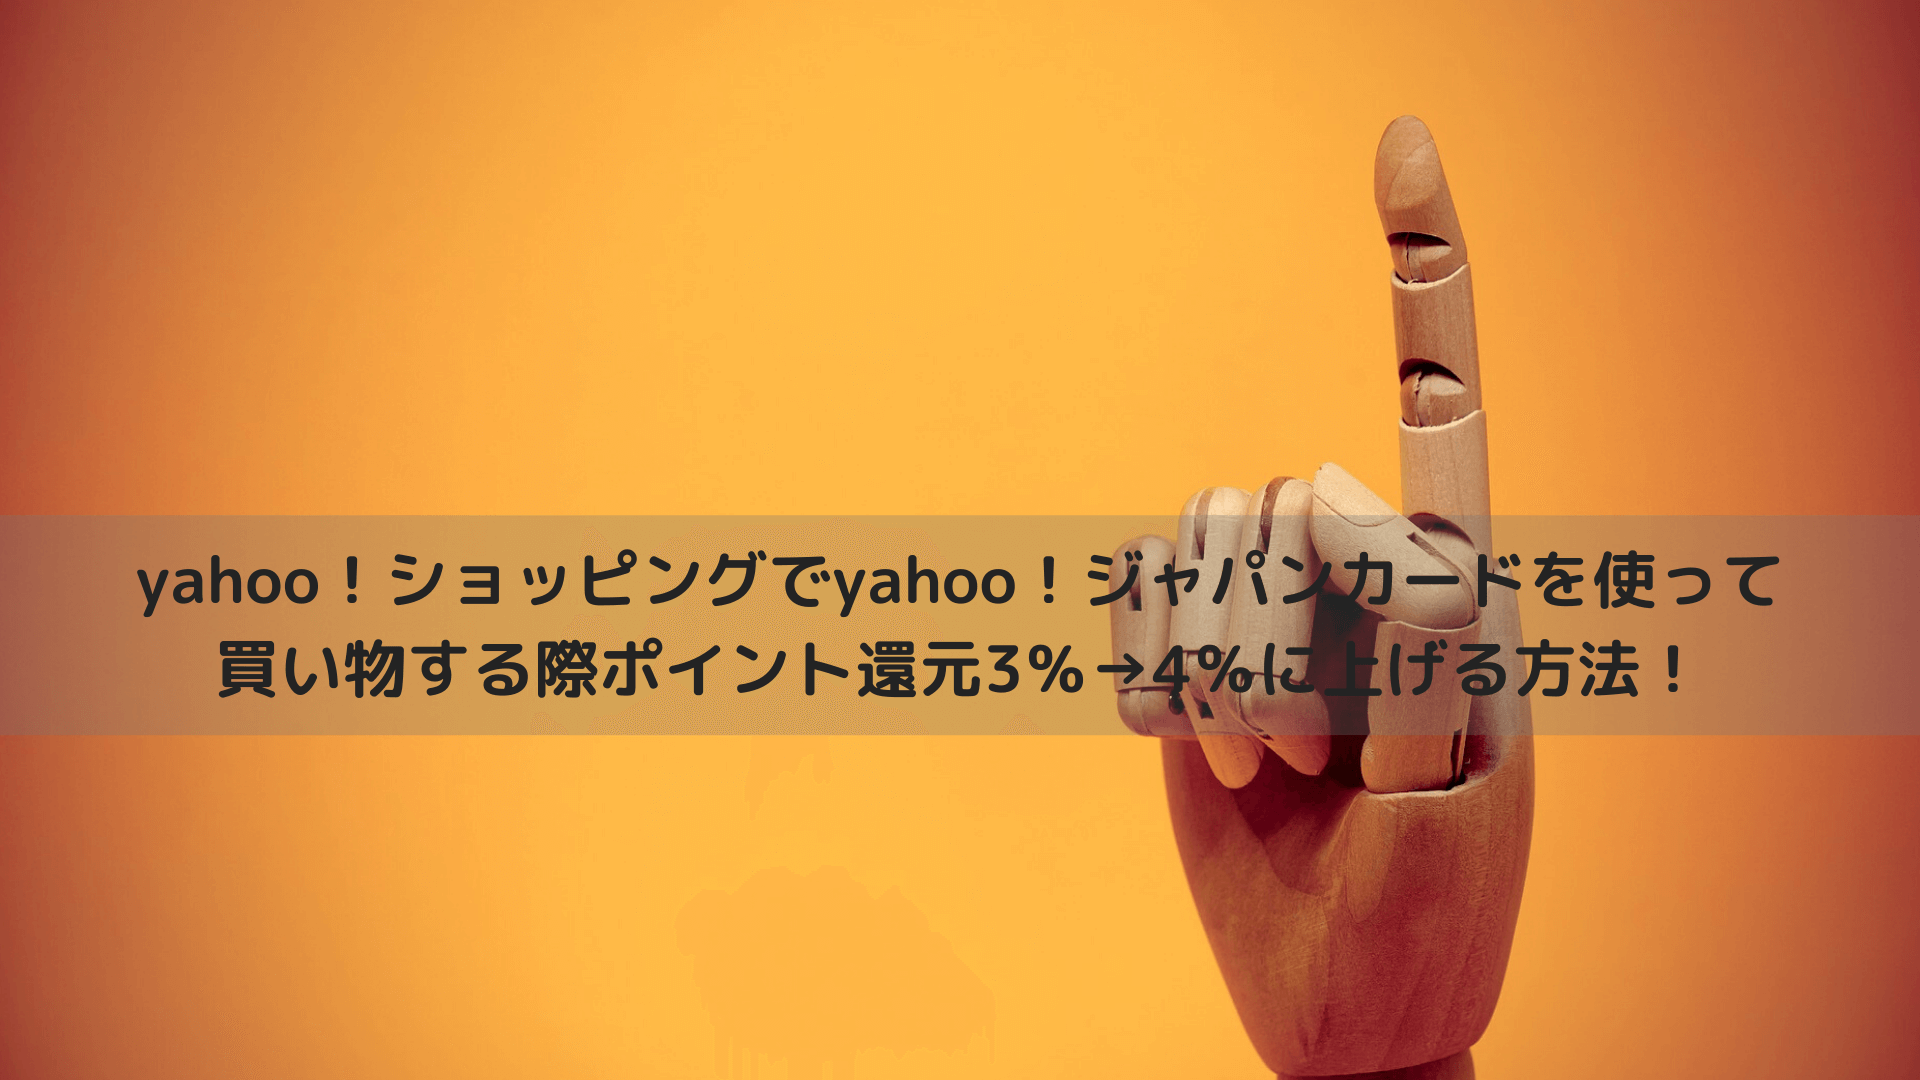 yahoo!ショッピングでyahoo!ジャパンカードを使って買い物する際ポイント還元3%→4%に上げる方法!